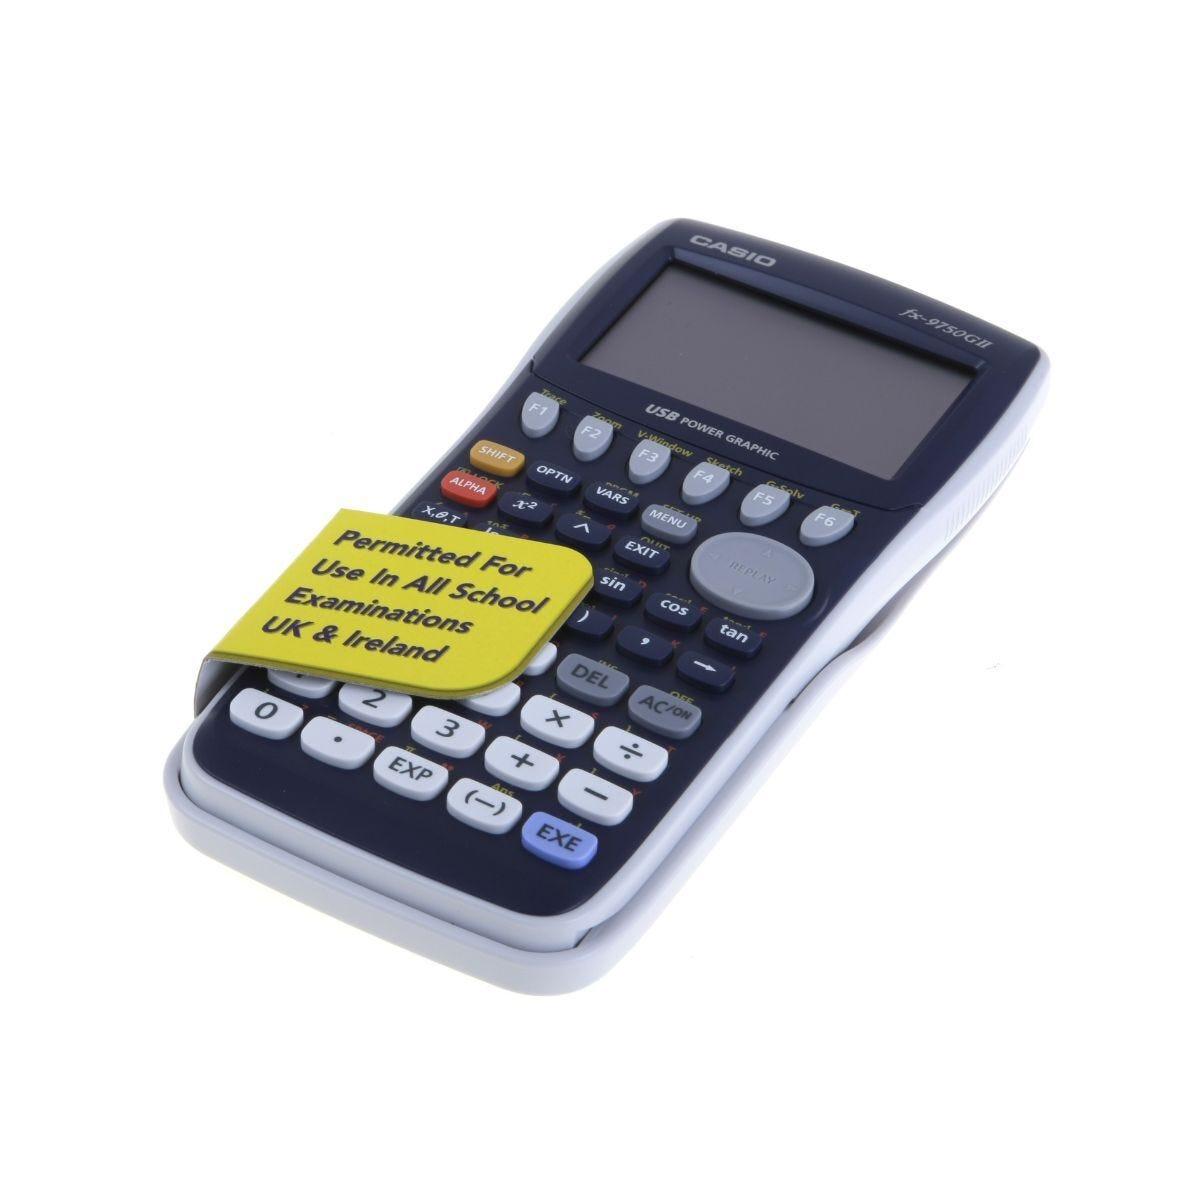 Casio FX-9750GII Graphic Handheld Calculator